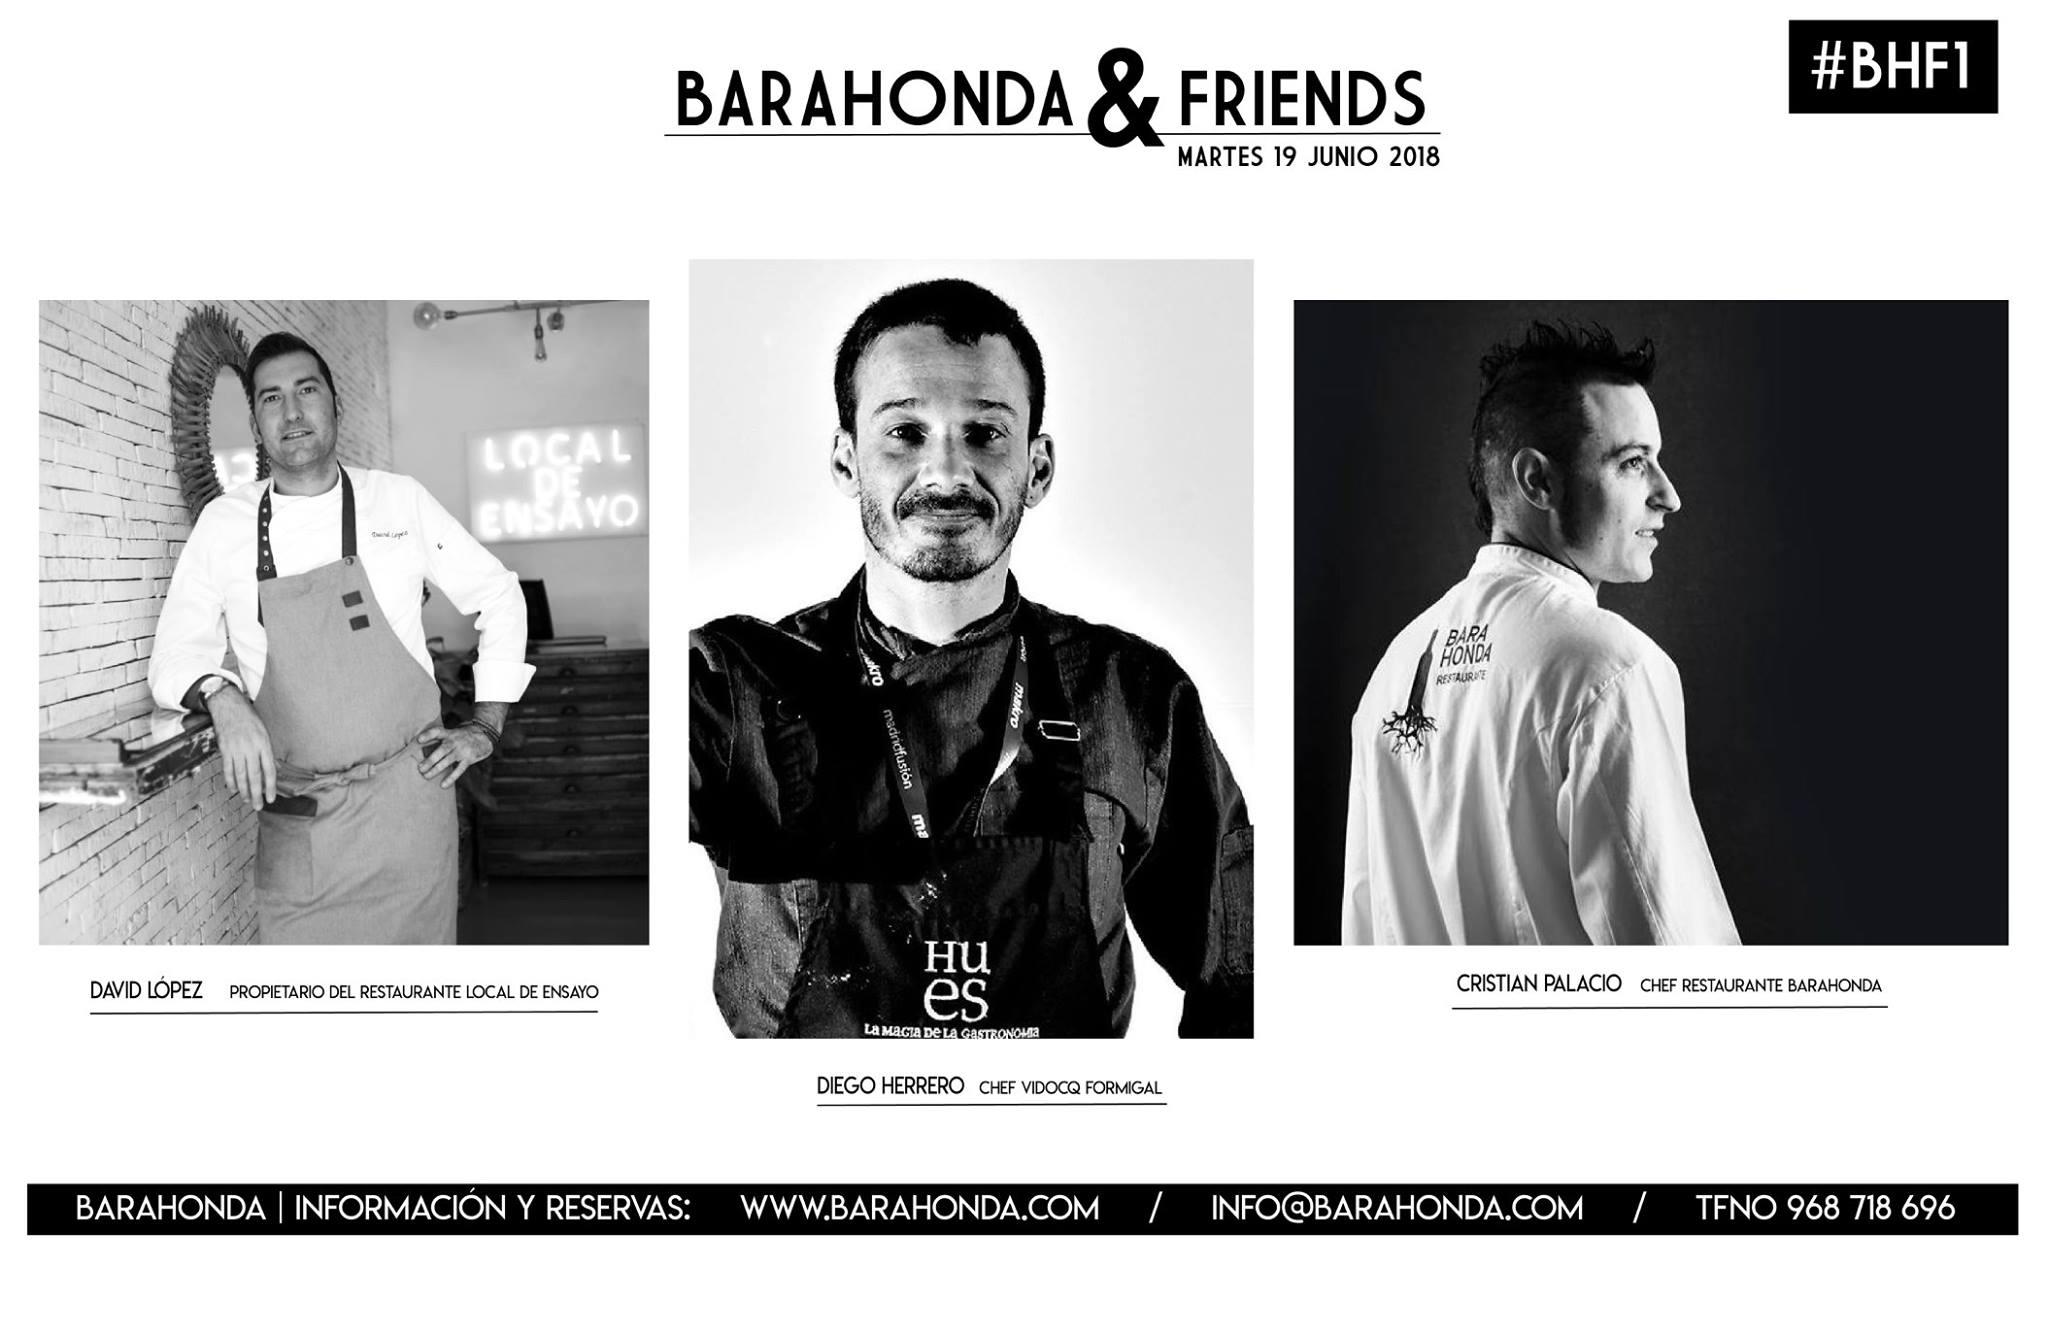 Barahonda & Friends